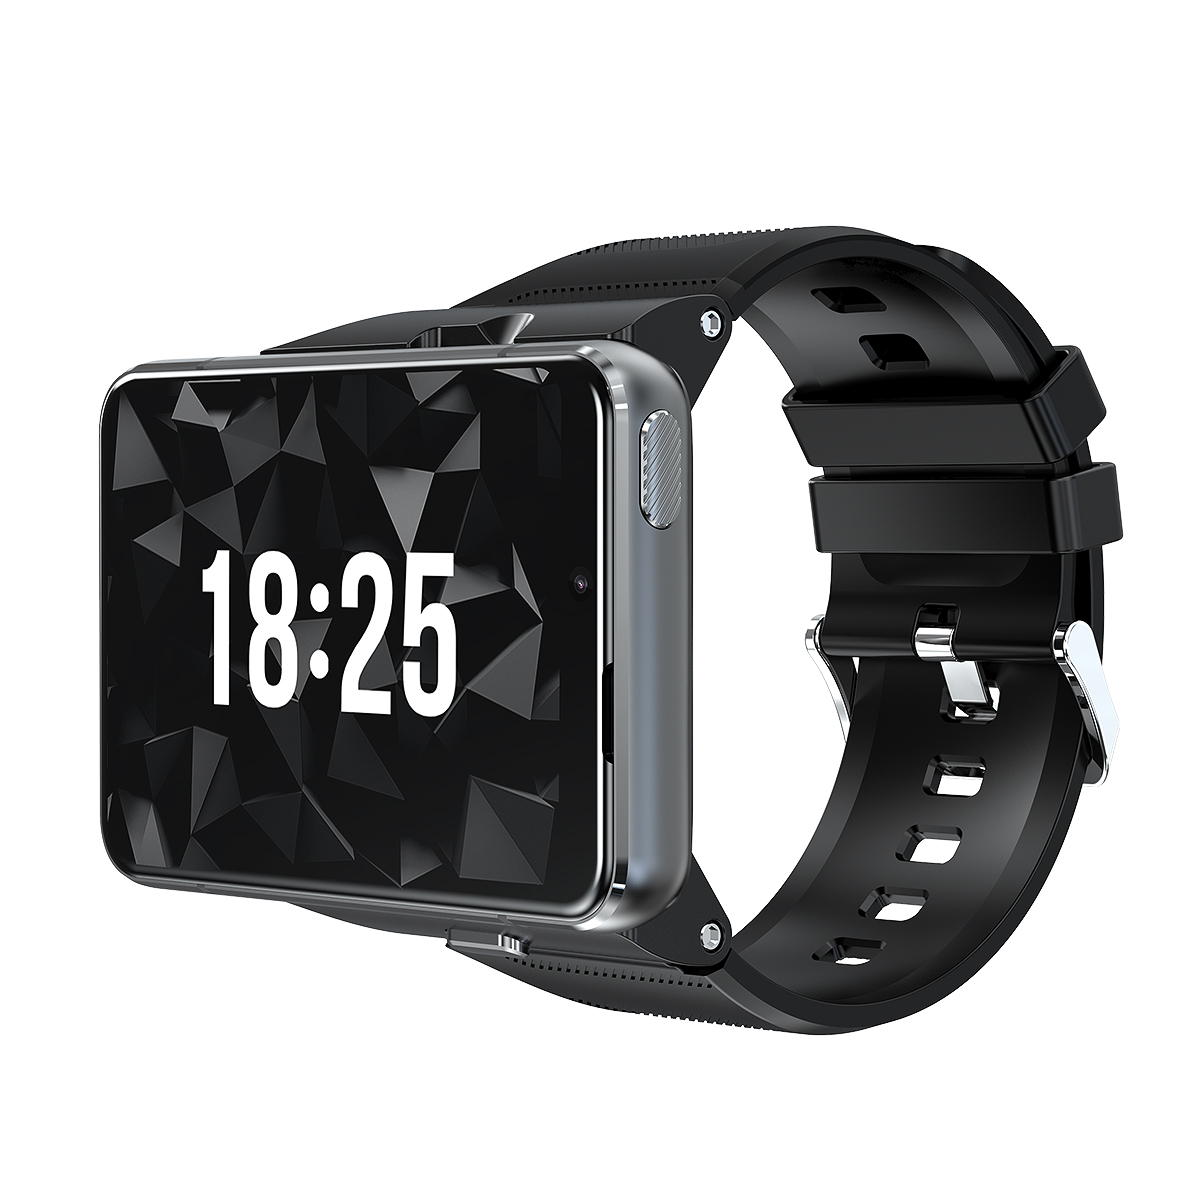 S999 Smartwatch 13 Million Pixel Full Netcom 4g Smart Bracelet 4+64gb Rechargeable Smart Bracelet black